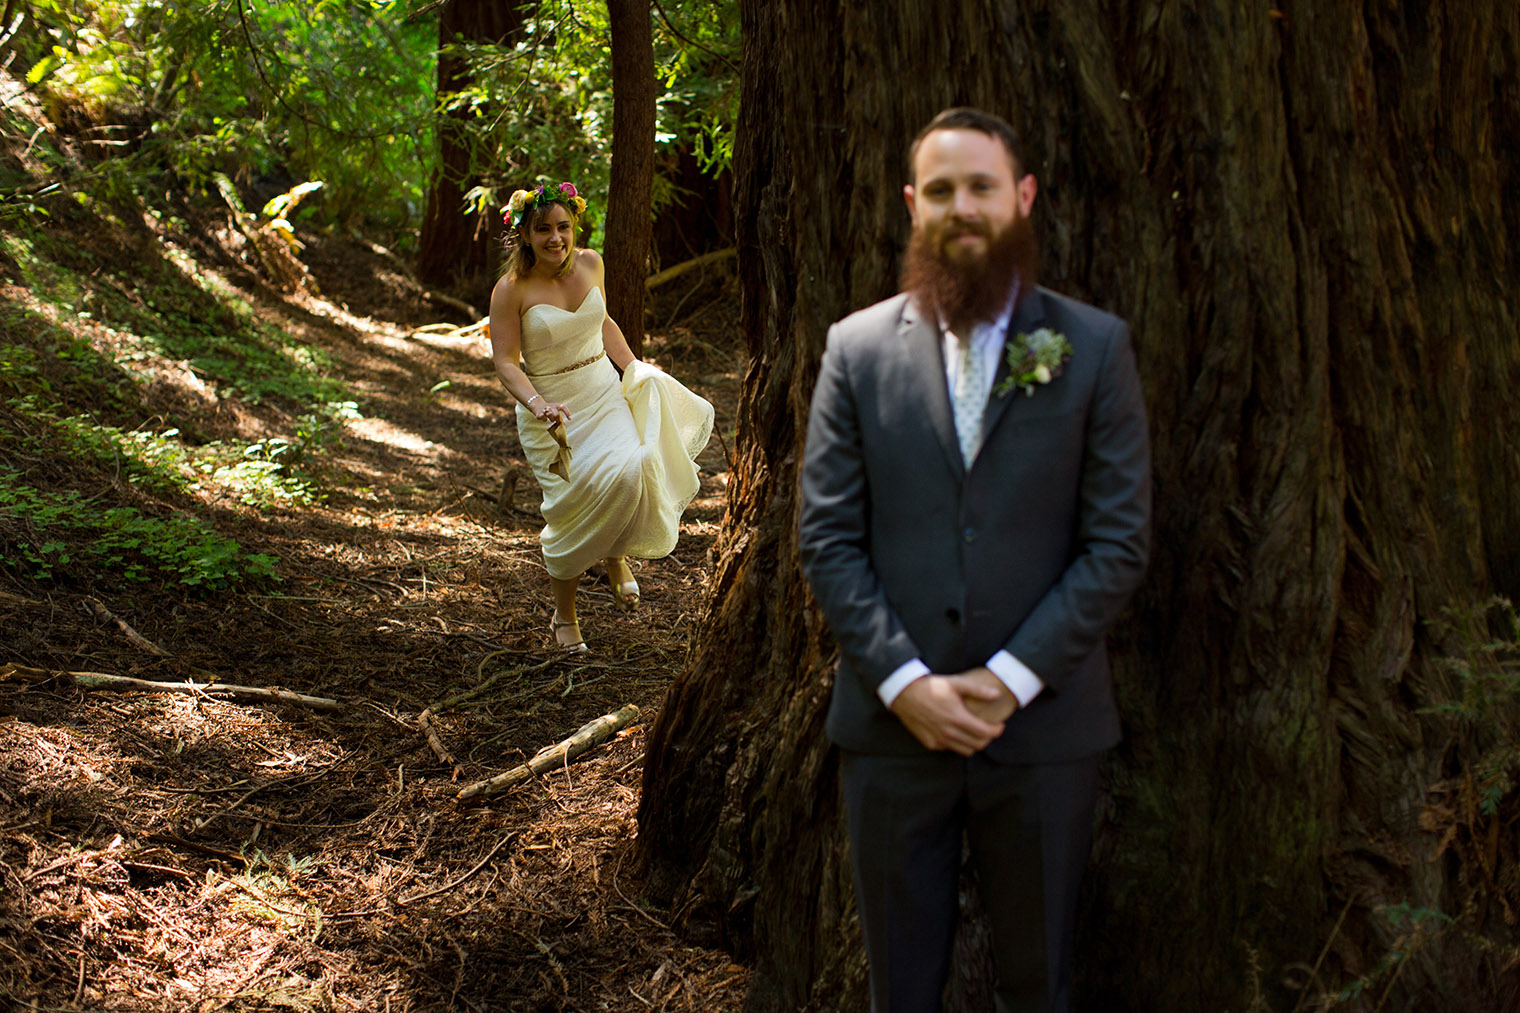 redwood wedding venue located near san francisco